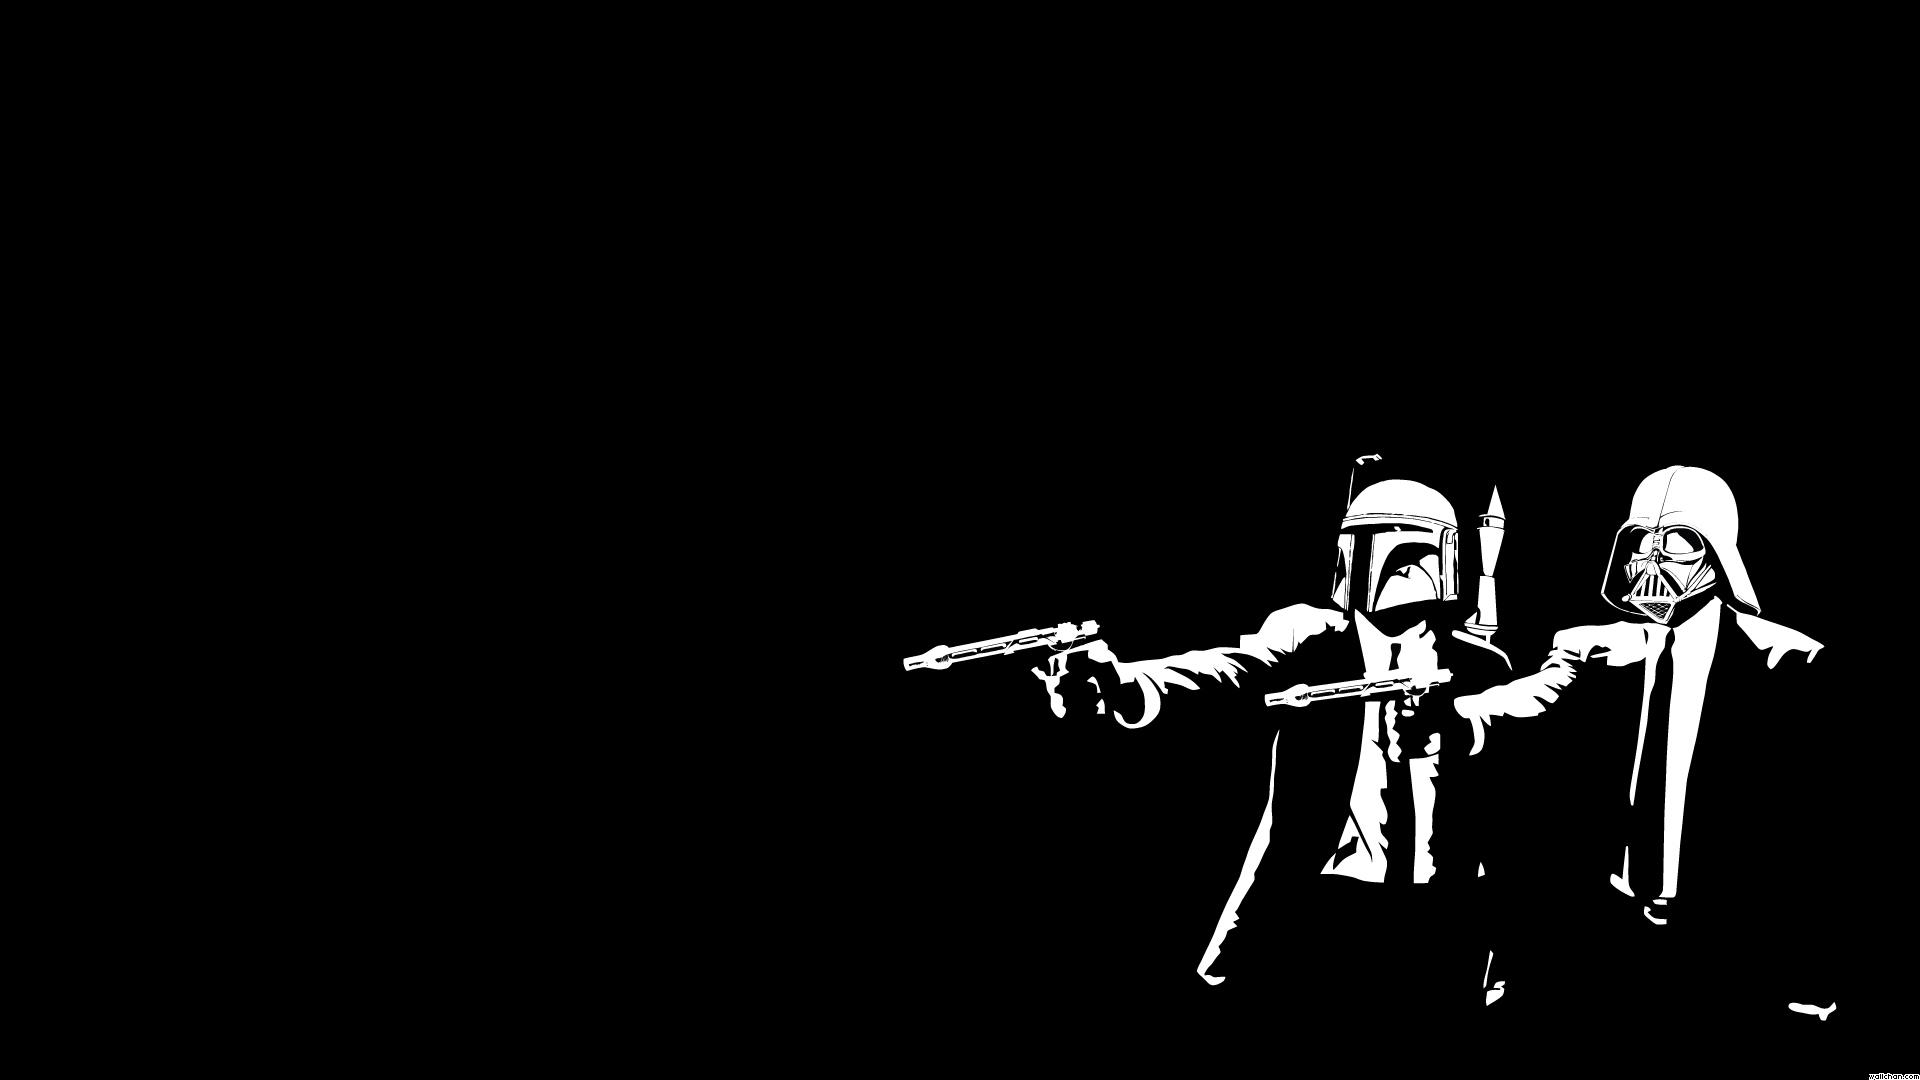 Star Wars Wallpaper A To Z By Masterbarkeep On Deviantart 1920x1080